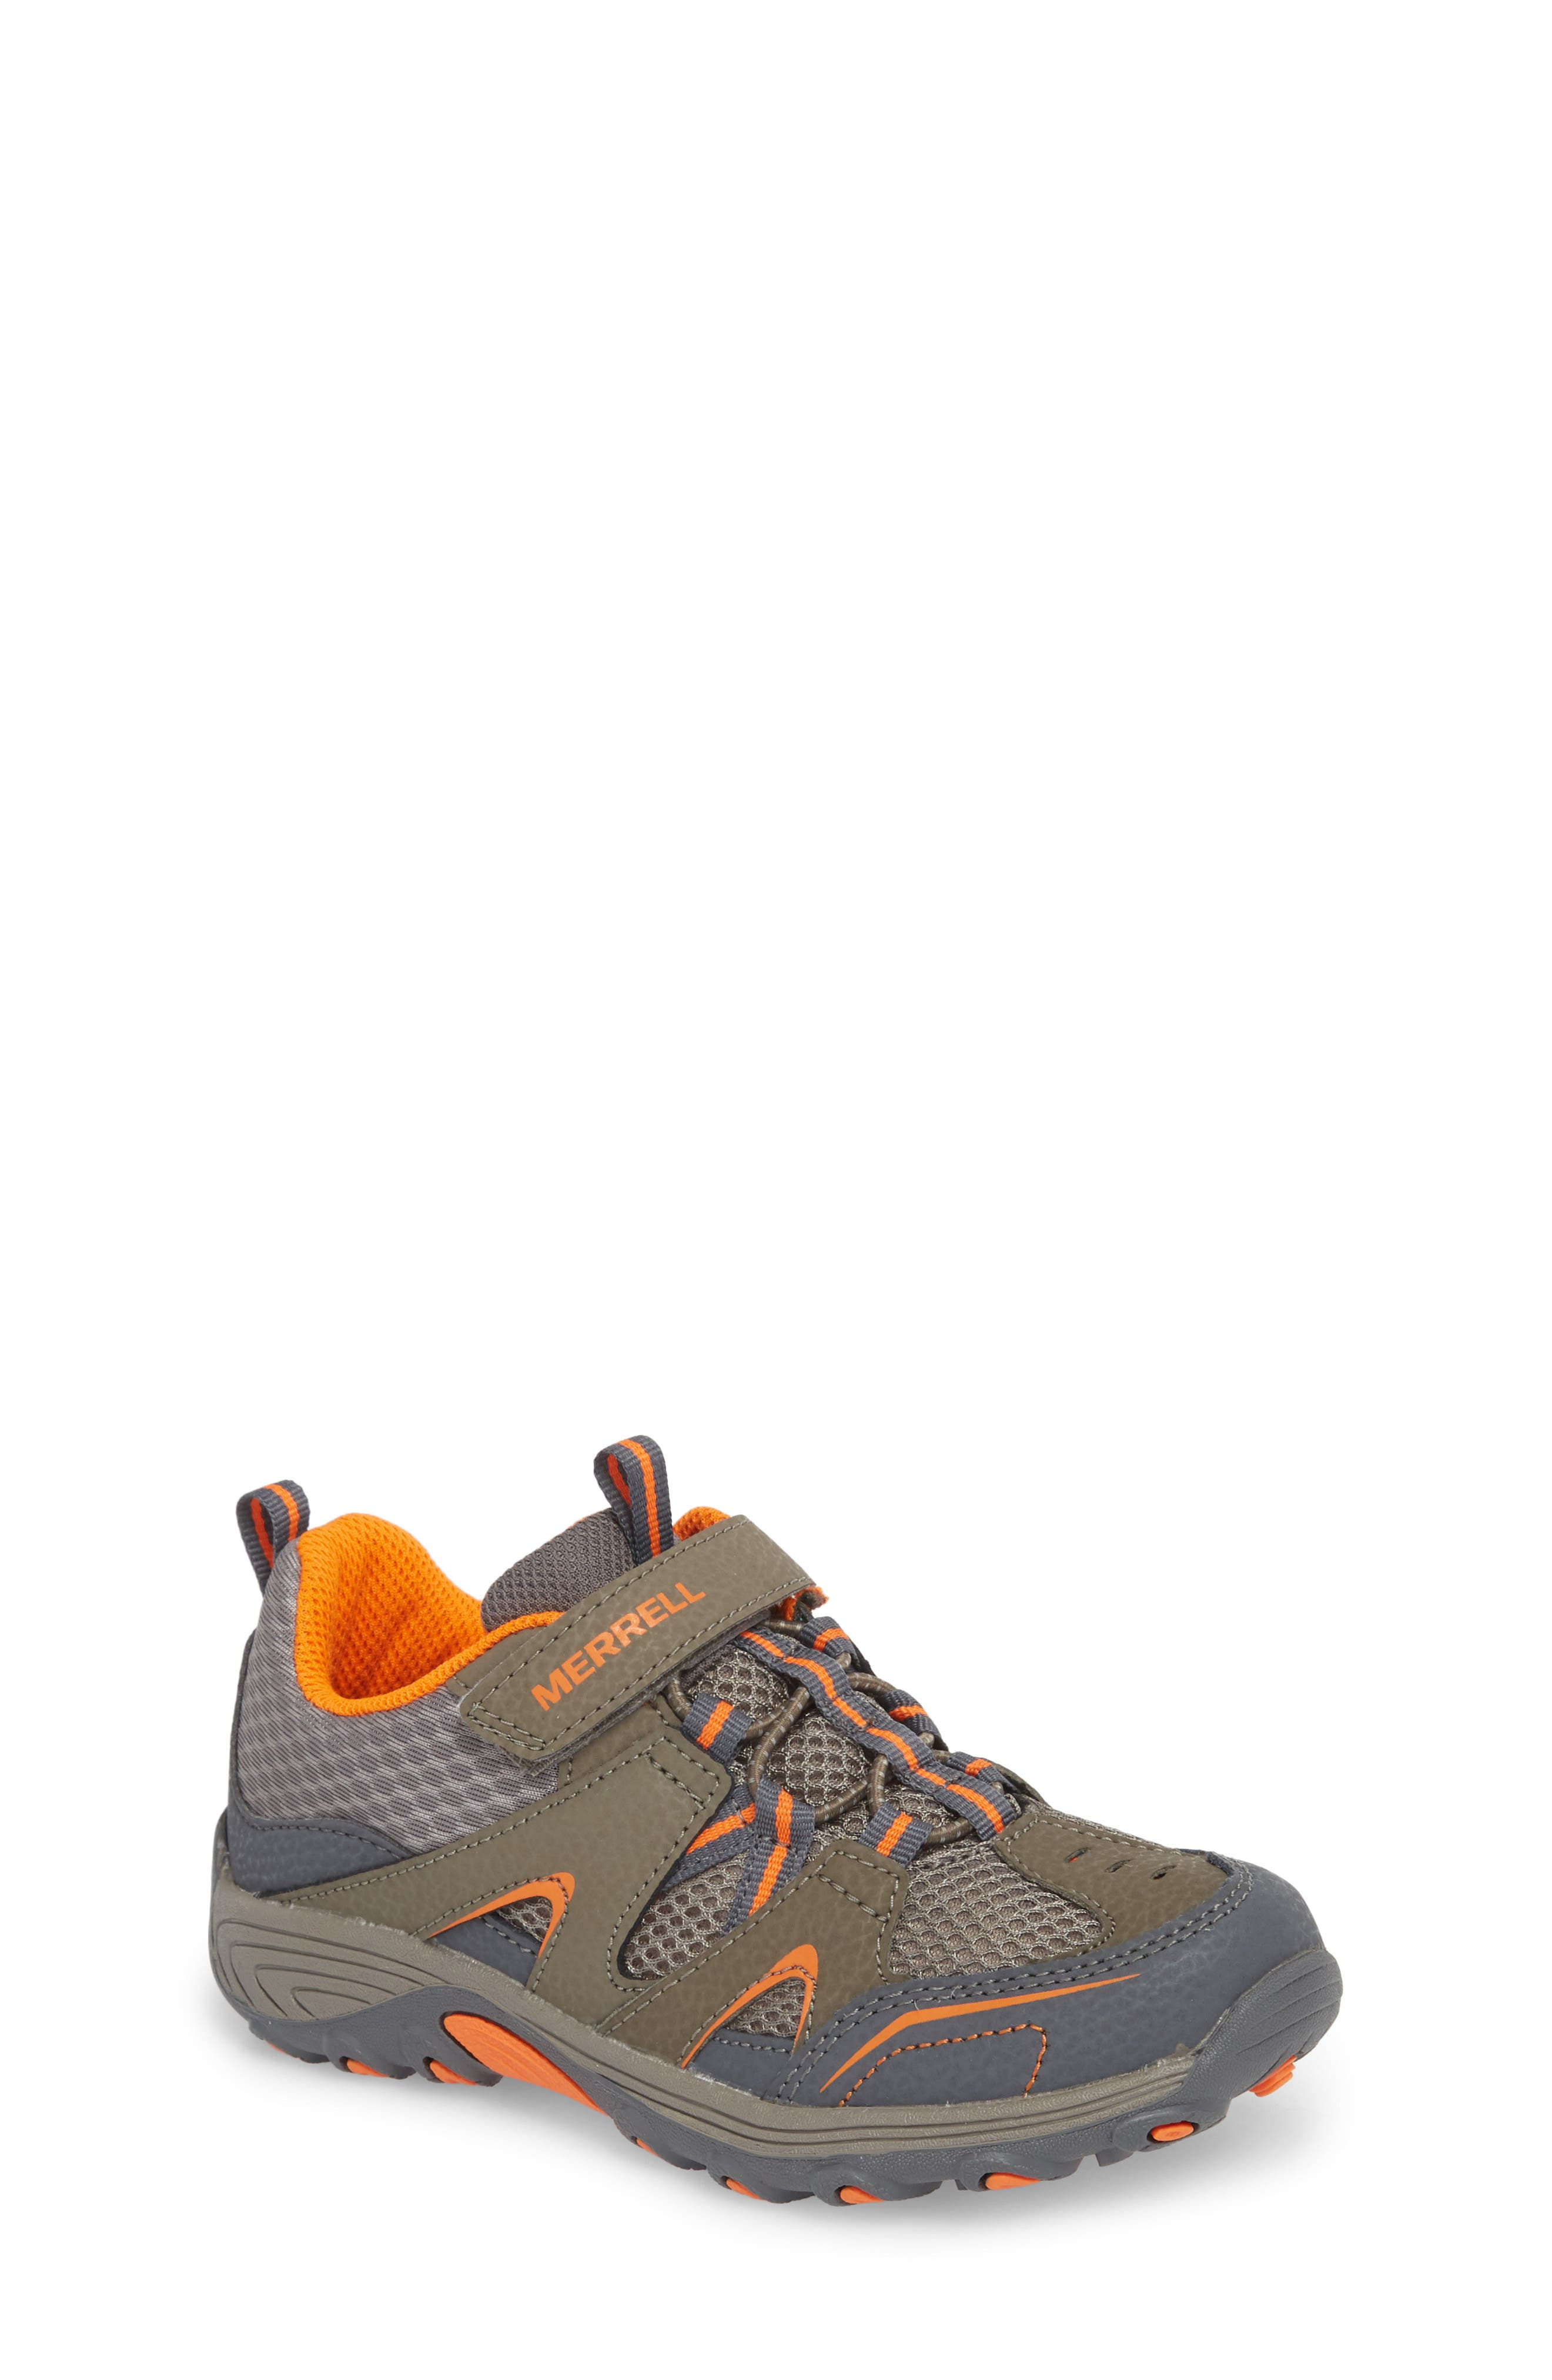 Trail Chaser Sneaker,                             Main thumbnail 1, color,                             Gunsmoke/ Orange